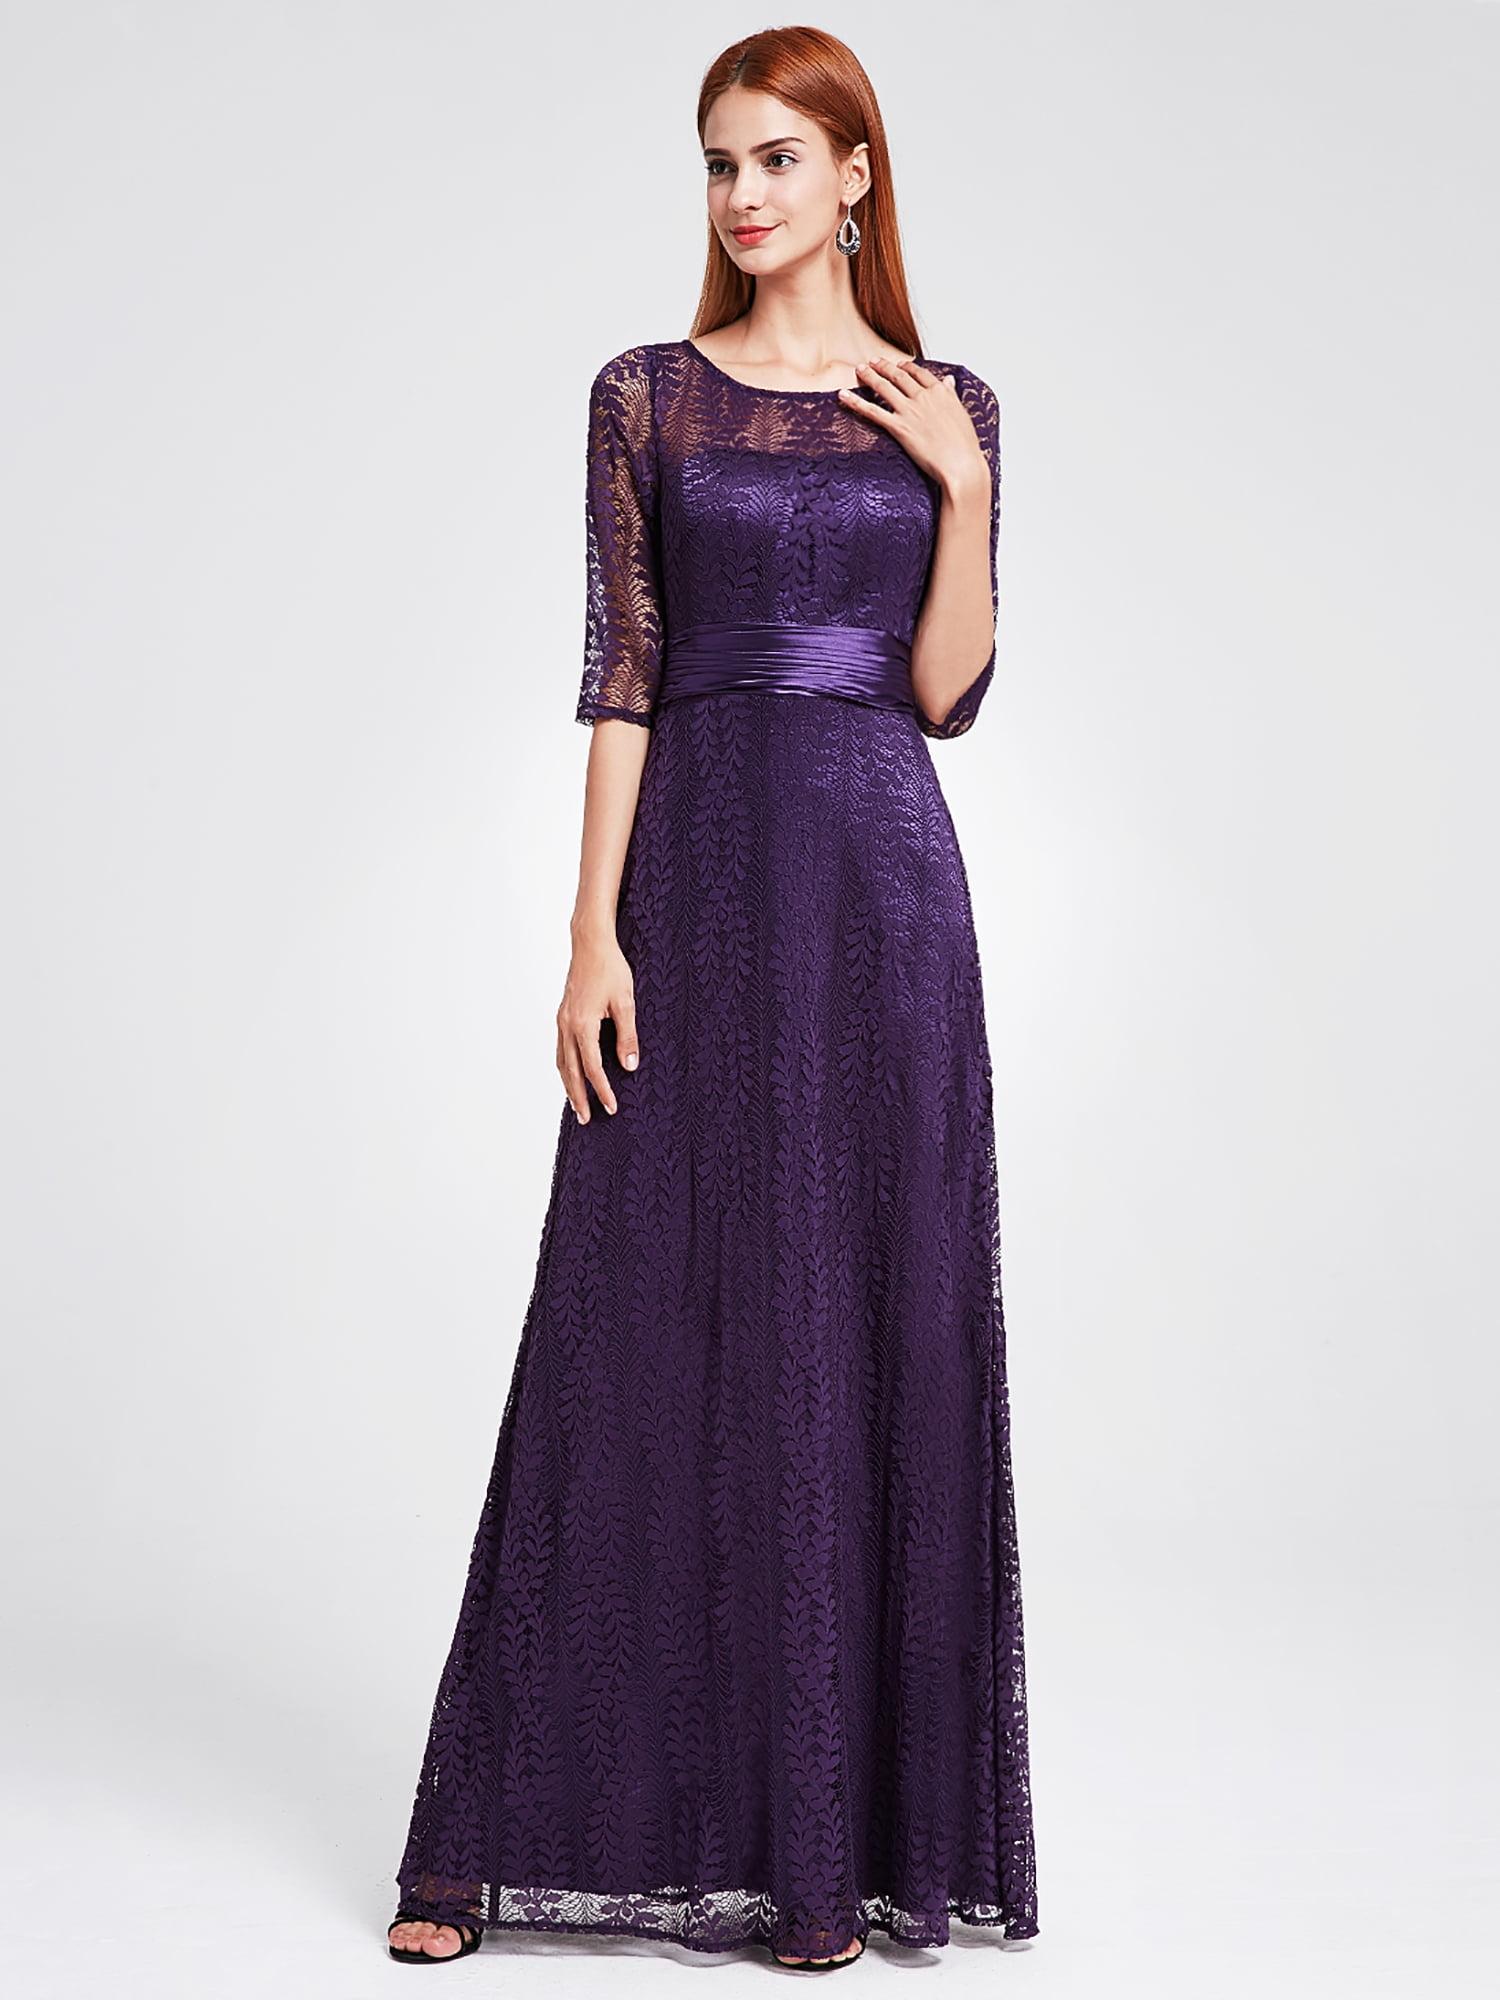 c9ff196ec2a Ever-Pretty - Ever-Pretty Women s Elegant Lace Long Sleeve Summer Wedding  Guest Bridesmaid Maxi Dresses 08878 for Women Purple 16 US Plus Size -  Walmart.com